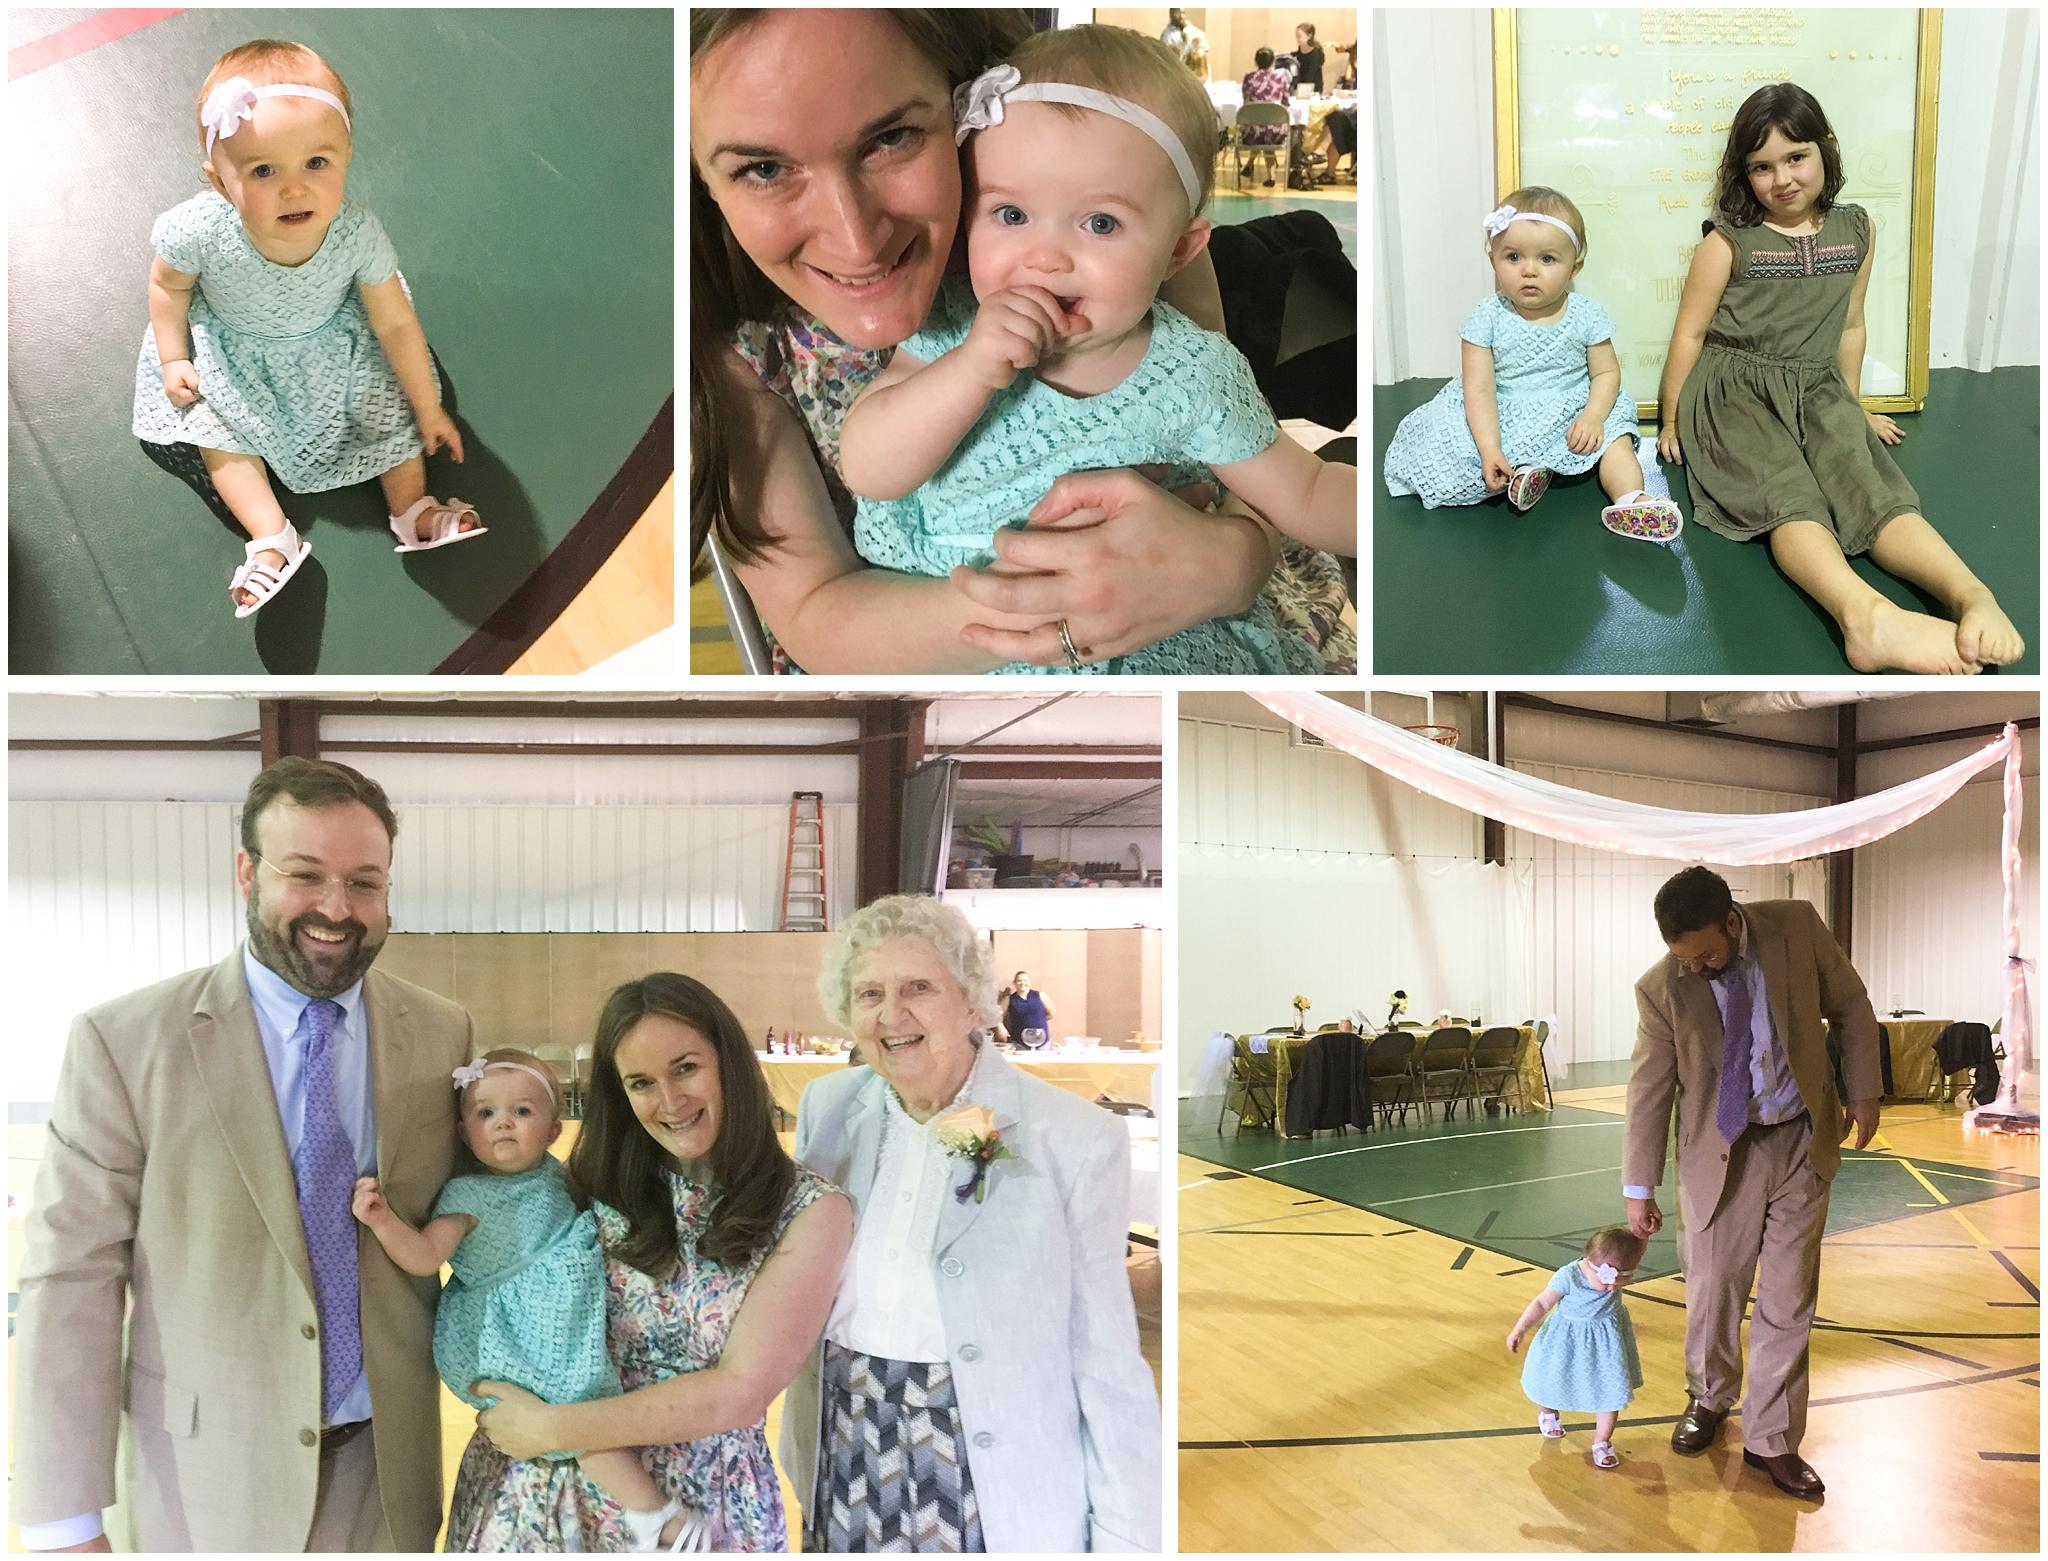 family snapshots at wedding reception